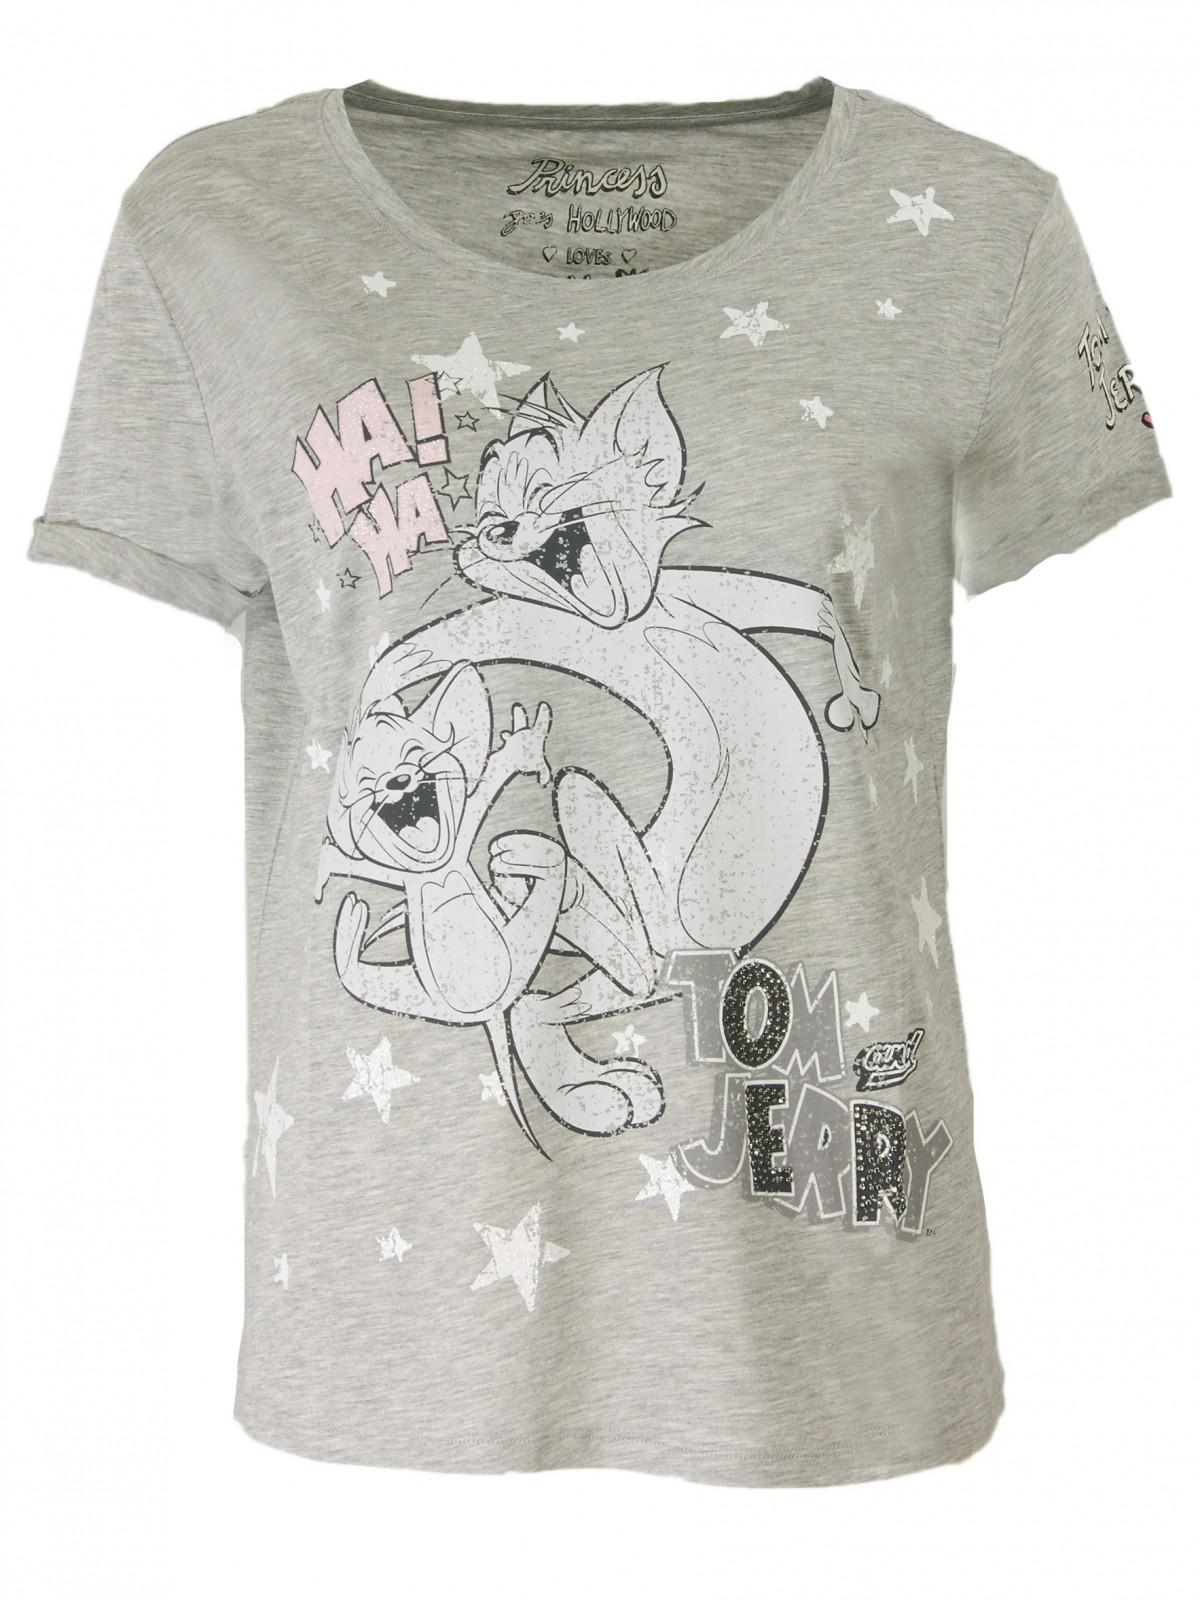 Tom & Jerry Dancing T-Shirt